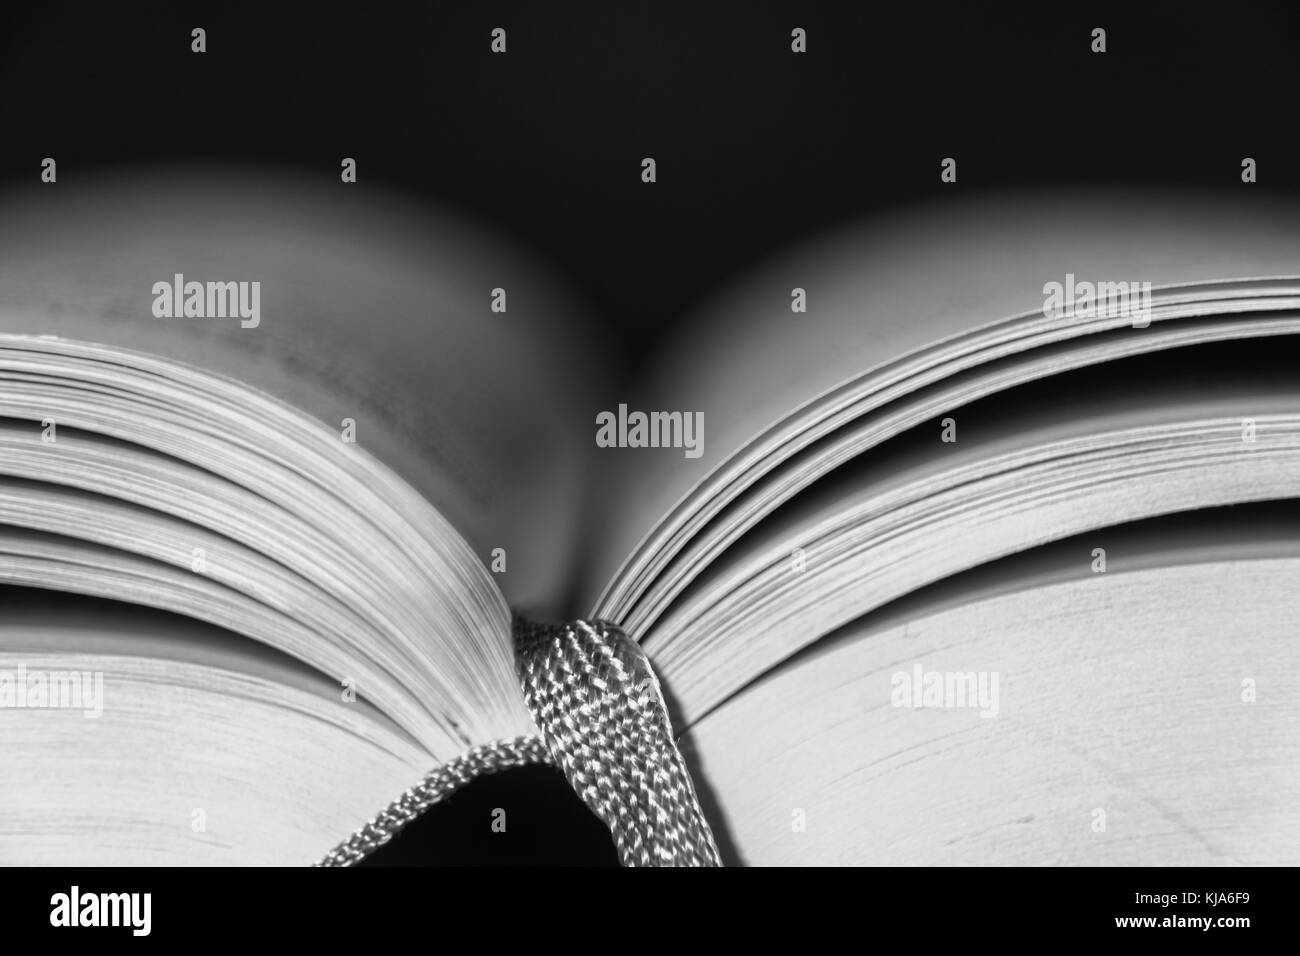 Livre ouvert avec ruban Photo Stock